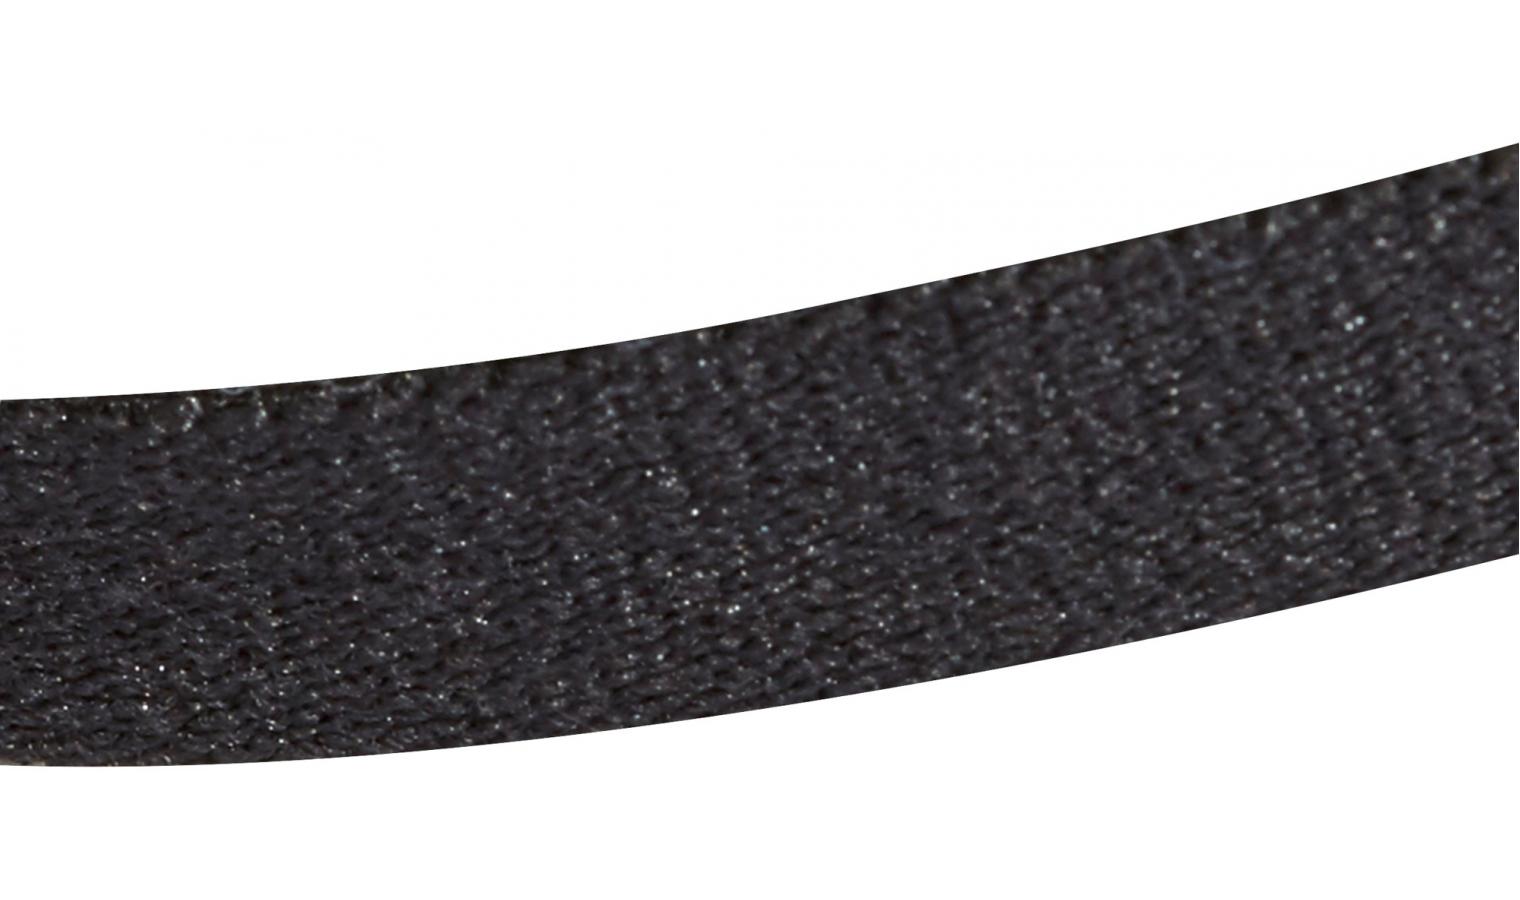 38c38f86125 Čelenka adidas 3PP HAIRBAND černá šedá růžová